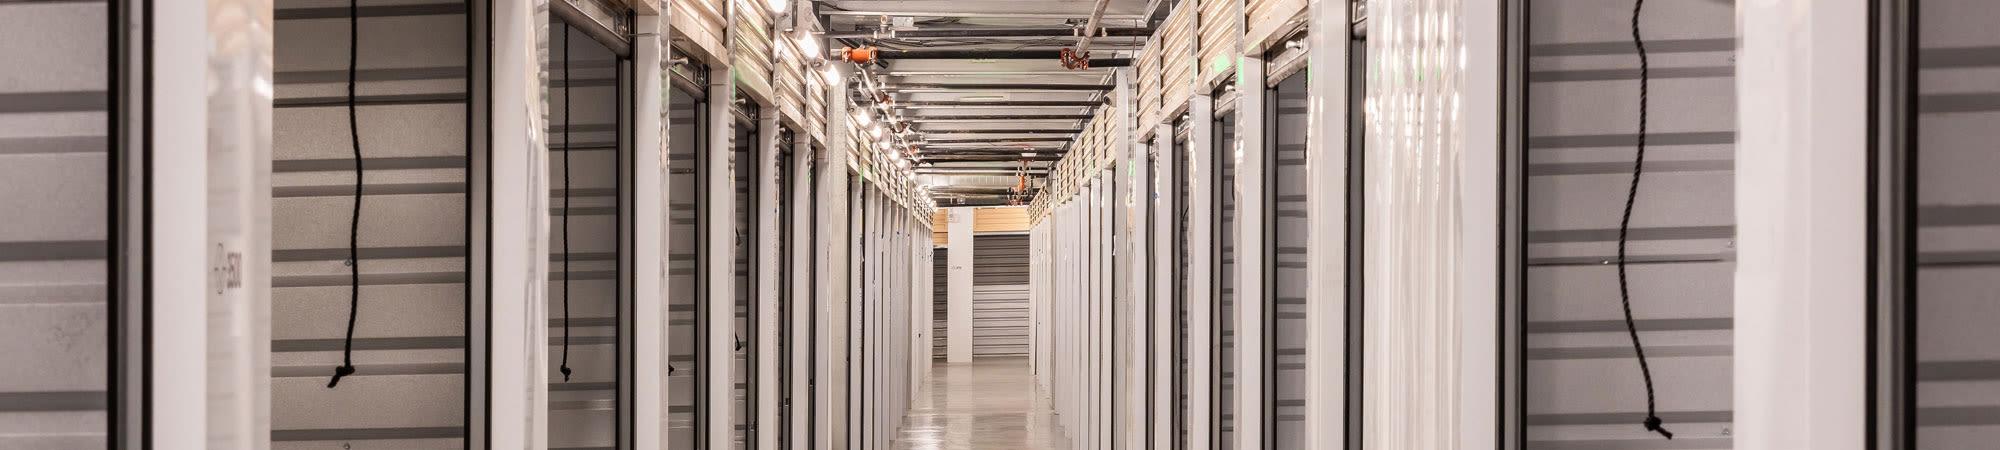 Climate-controlled storage at Cubes Self Storage in Millcreek, Utah